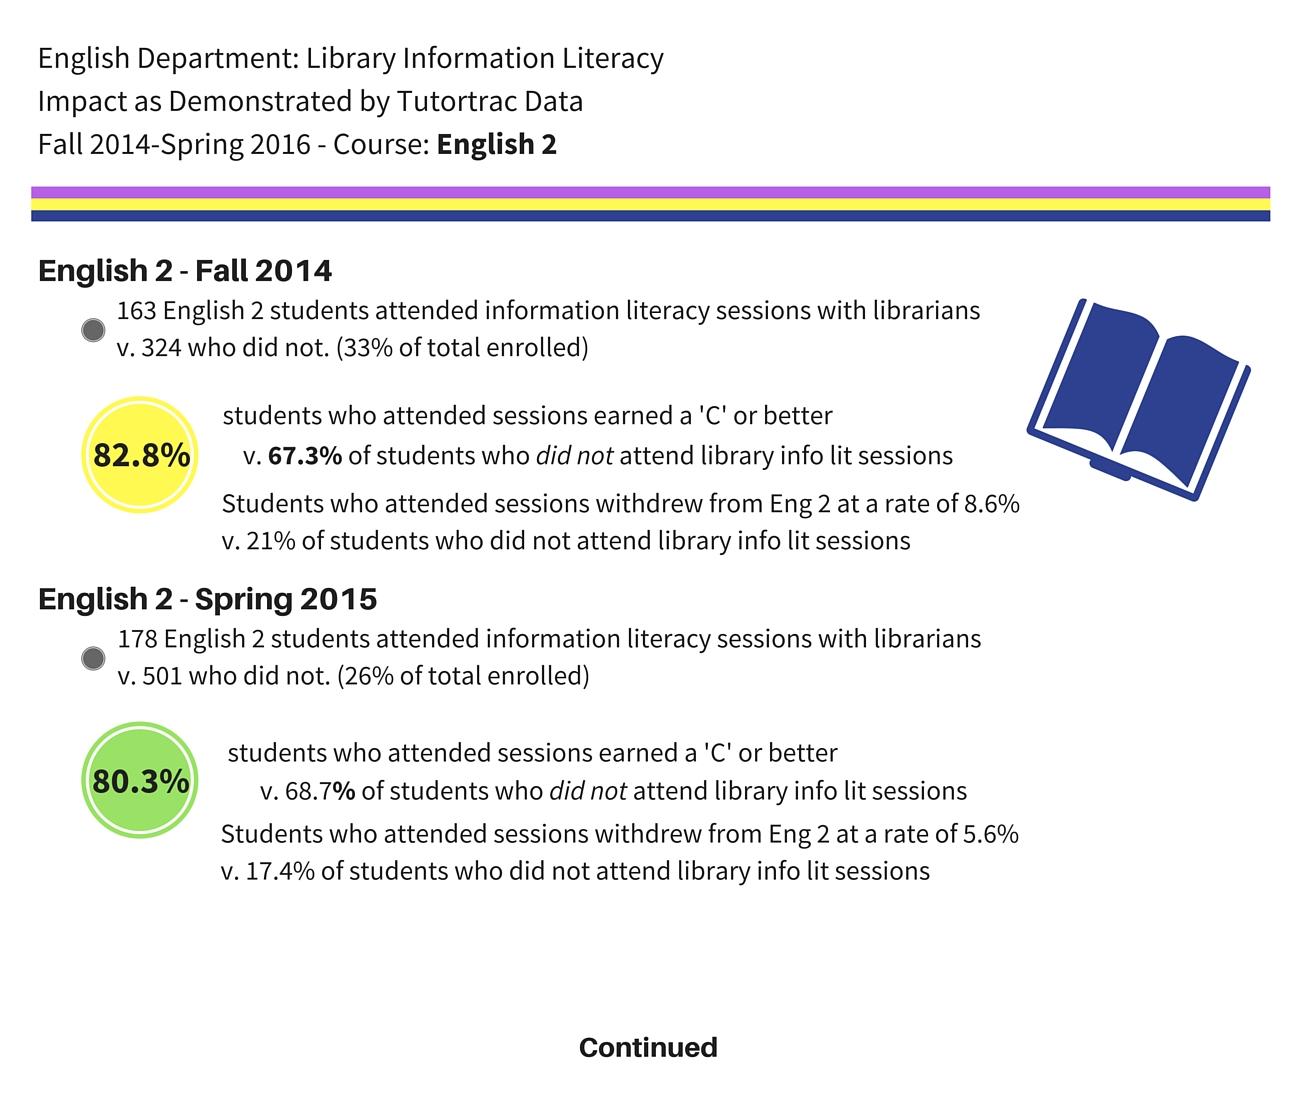 Image: data re: tutortrac data from English 2